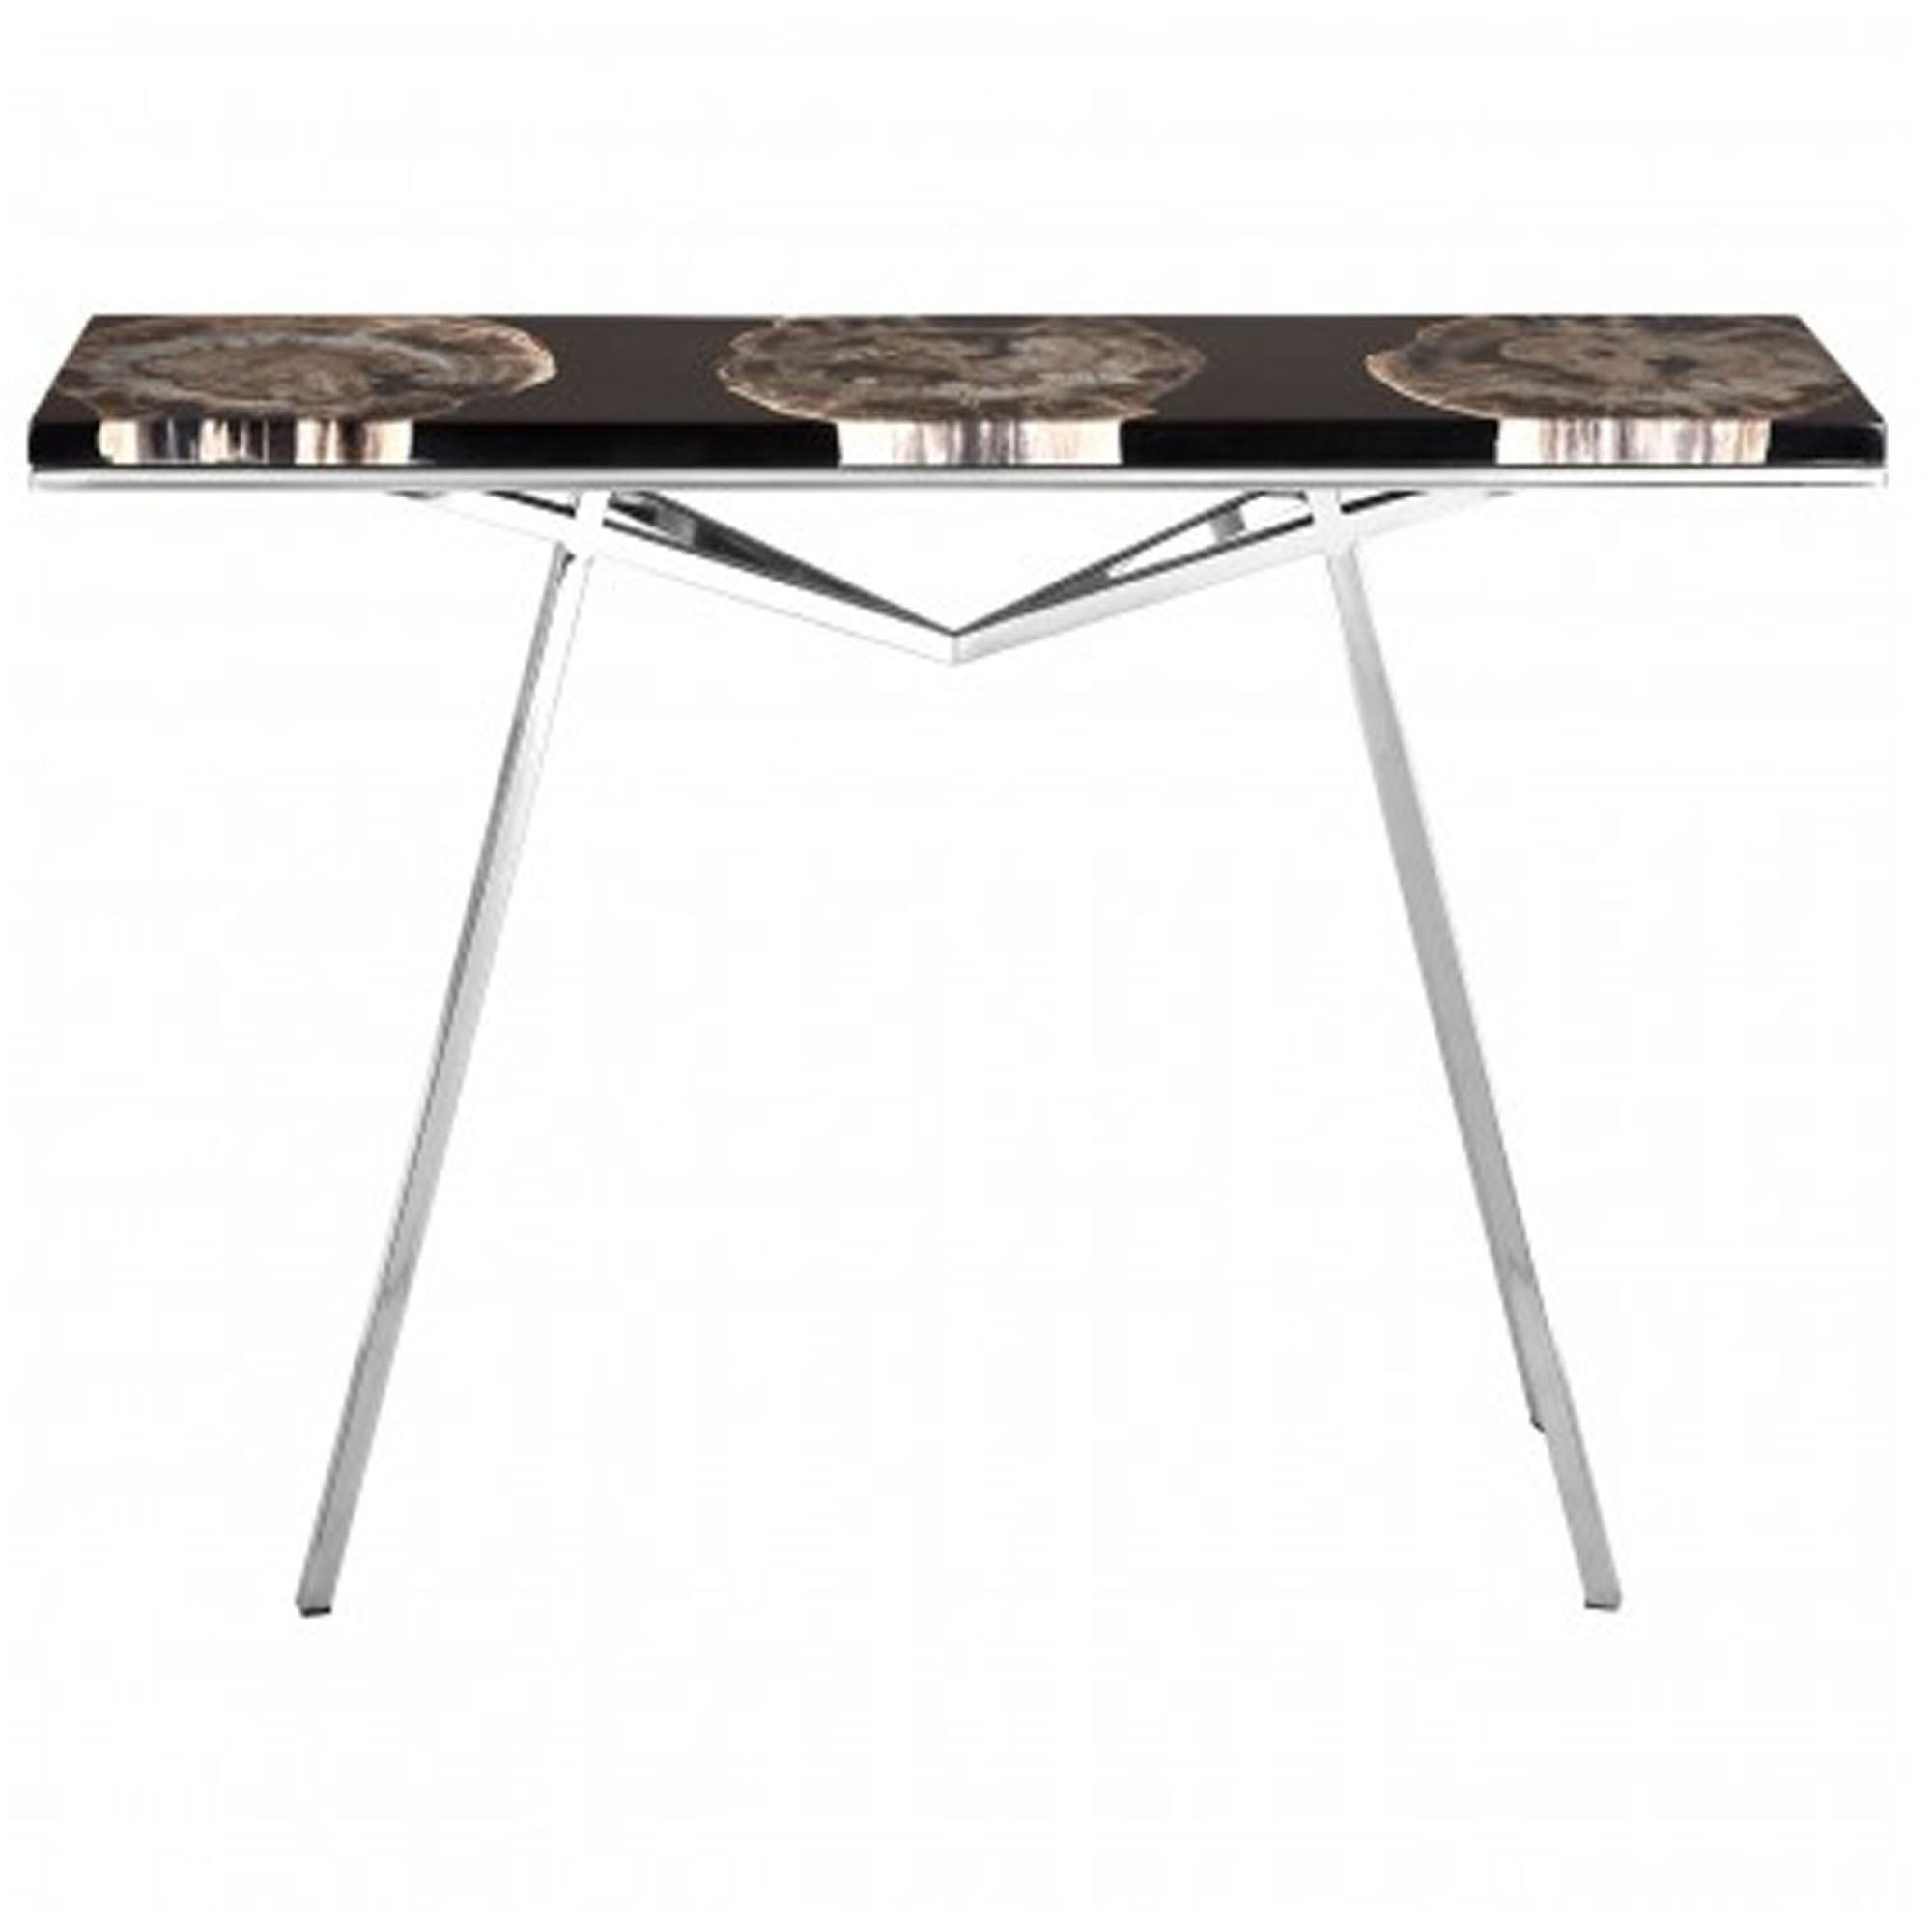 classic fit 45fa2 79803 Relic Black Resin/Silver Legs Console Table